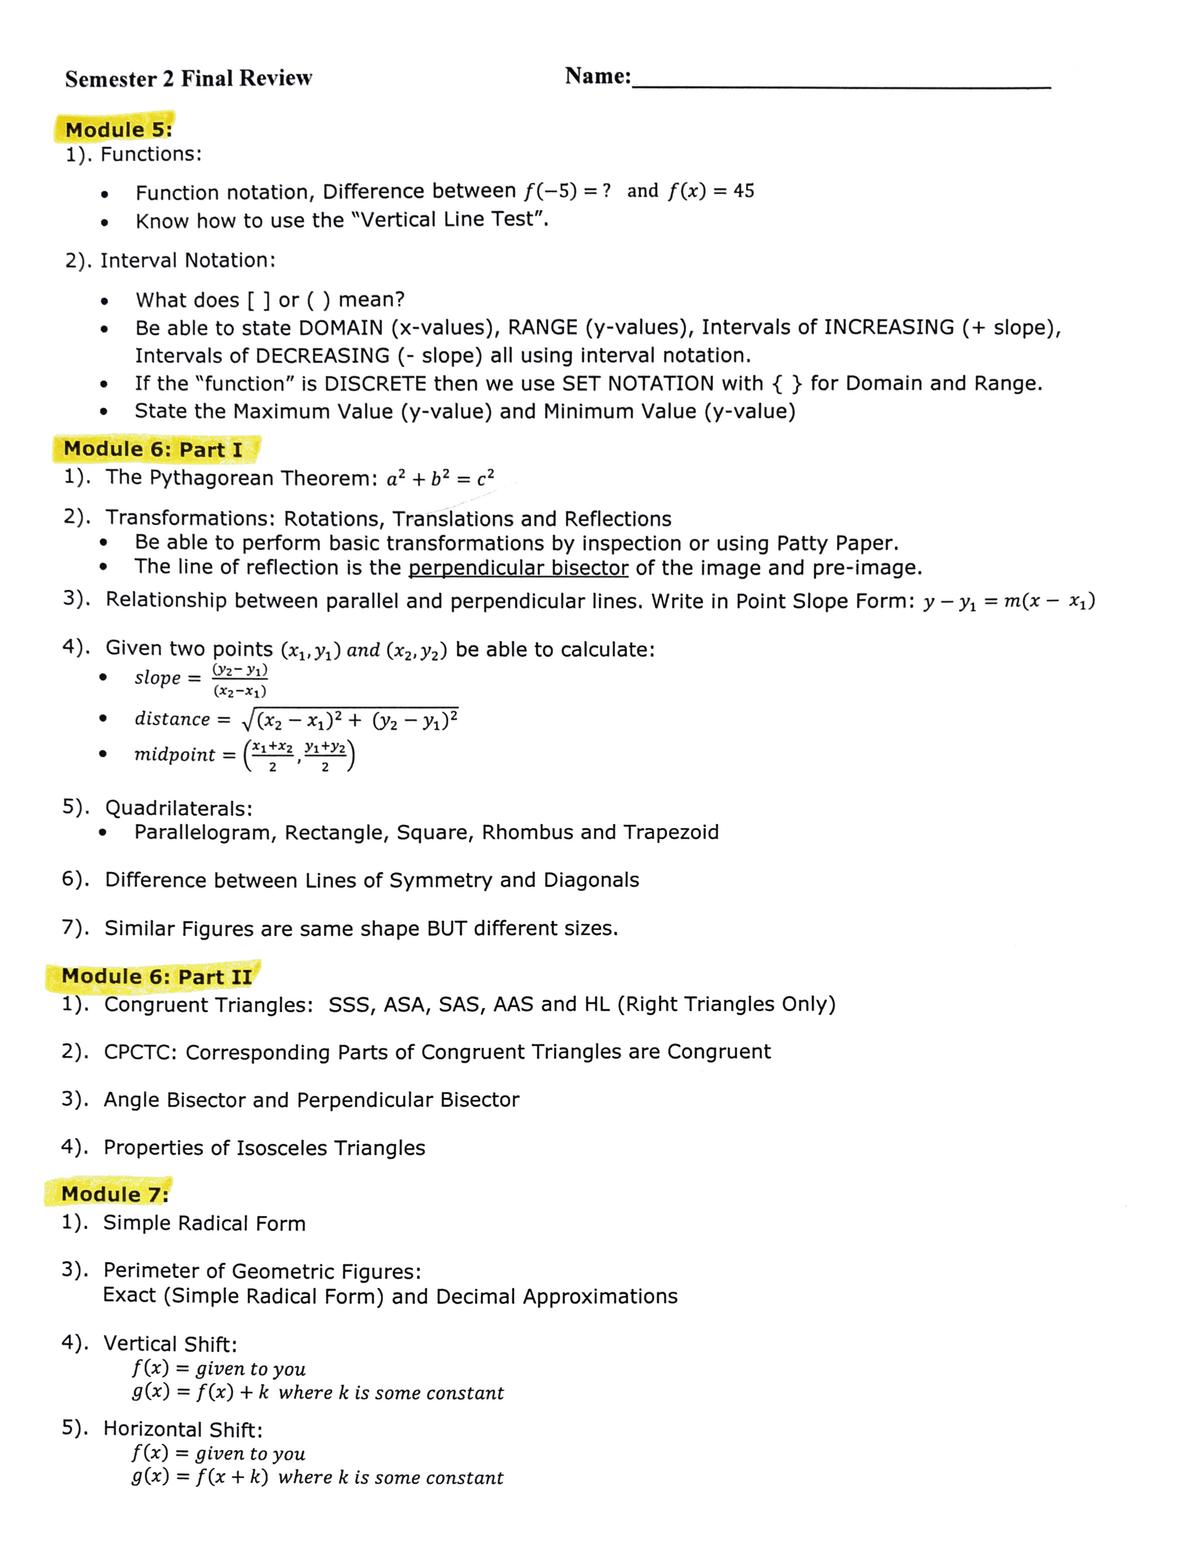 Bestseller: Geometry Pre Post Semester 2 Answers